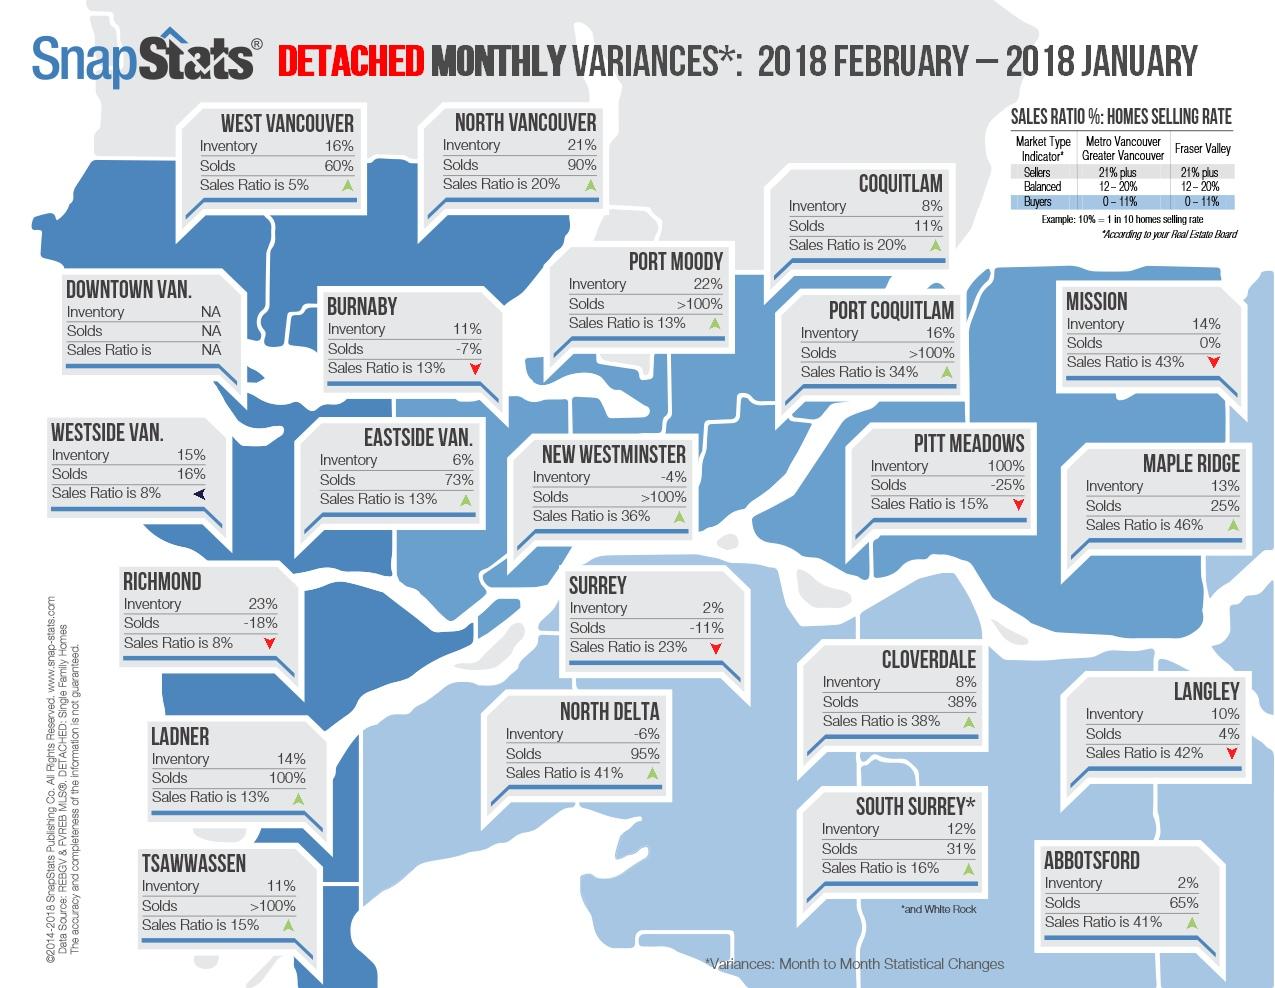 wwwsnap statscom det monthly 2018 february